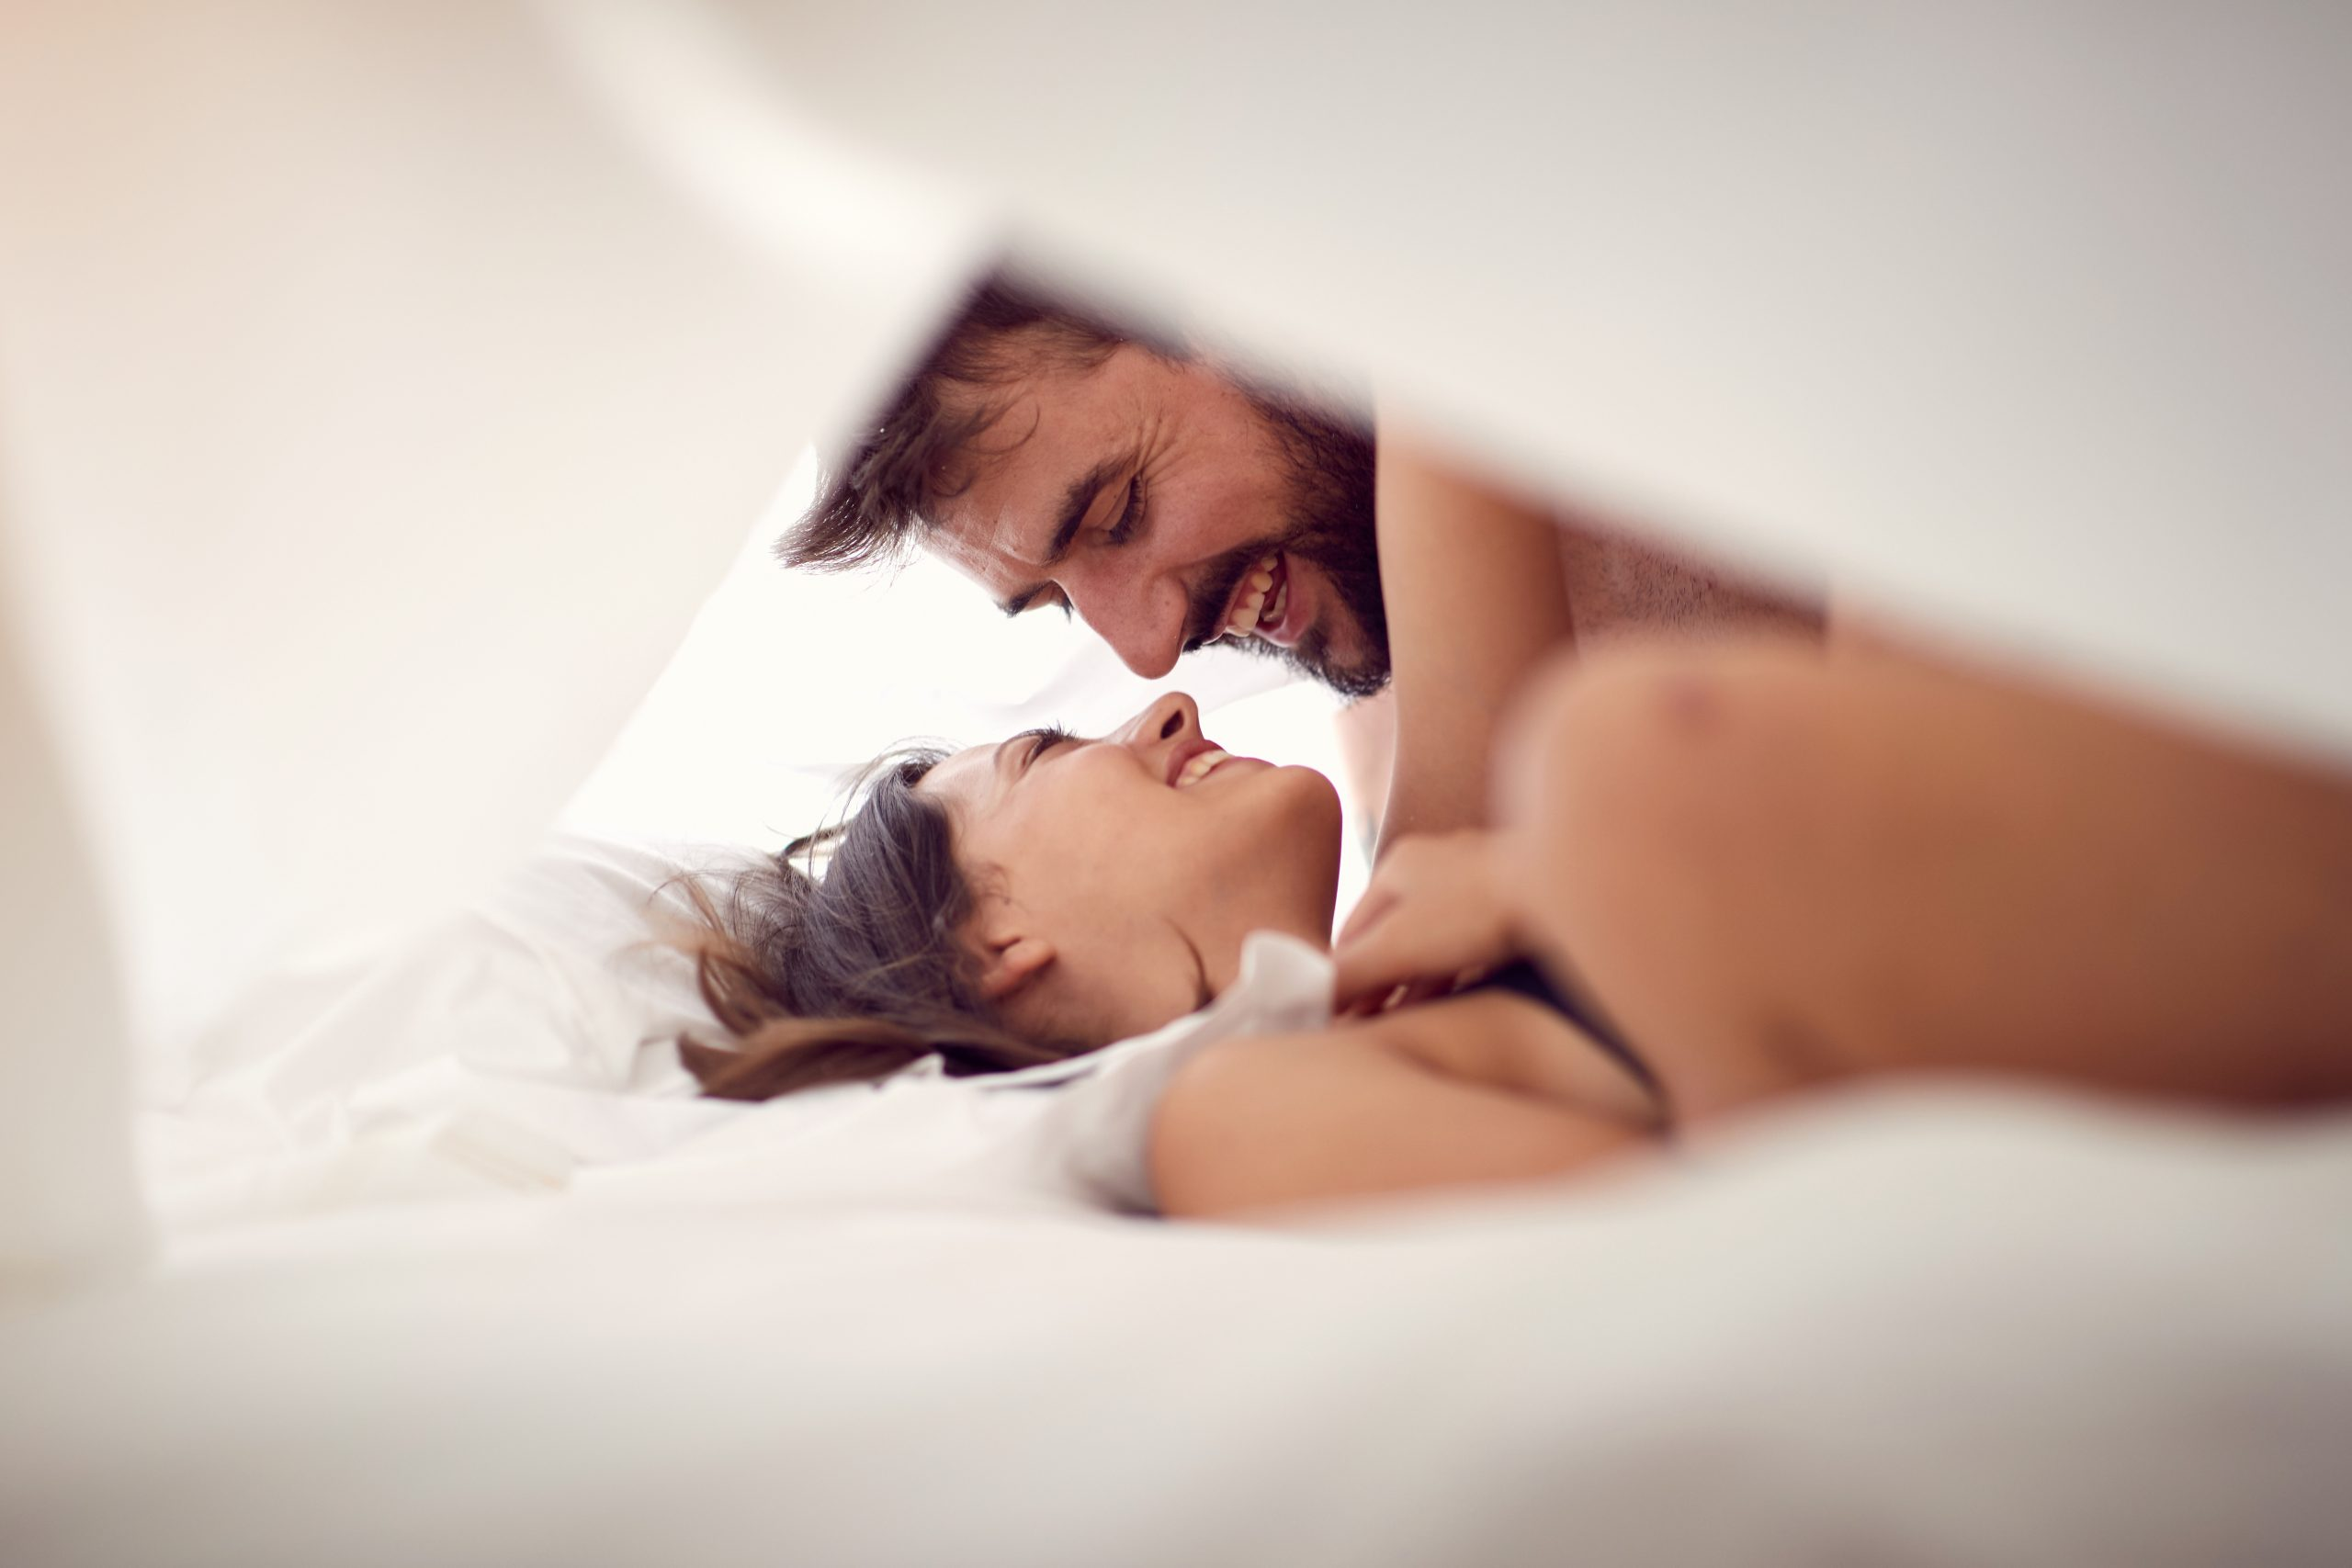 Kommunikation im Bett